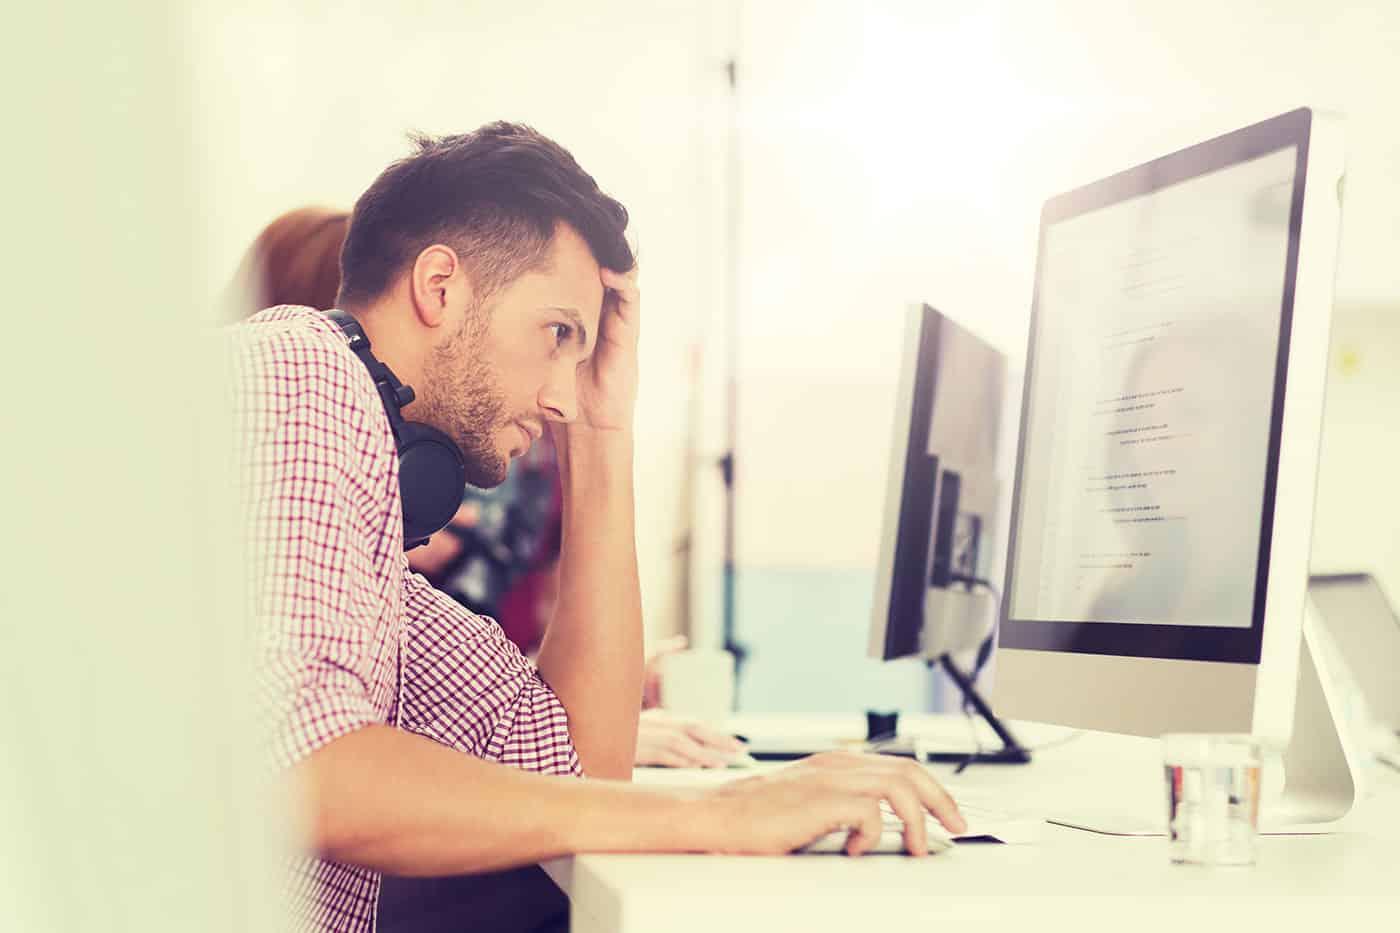 8 recomendaciones para manejar el estrés laboral